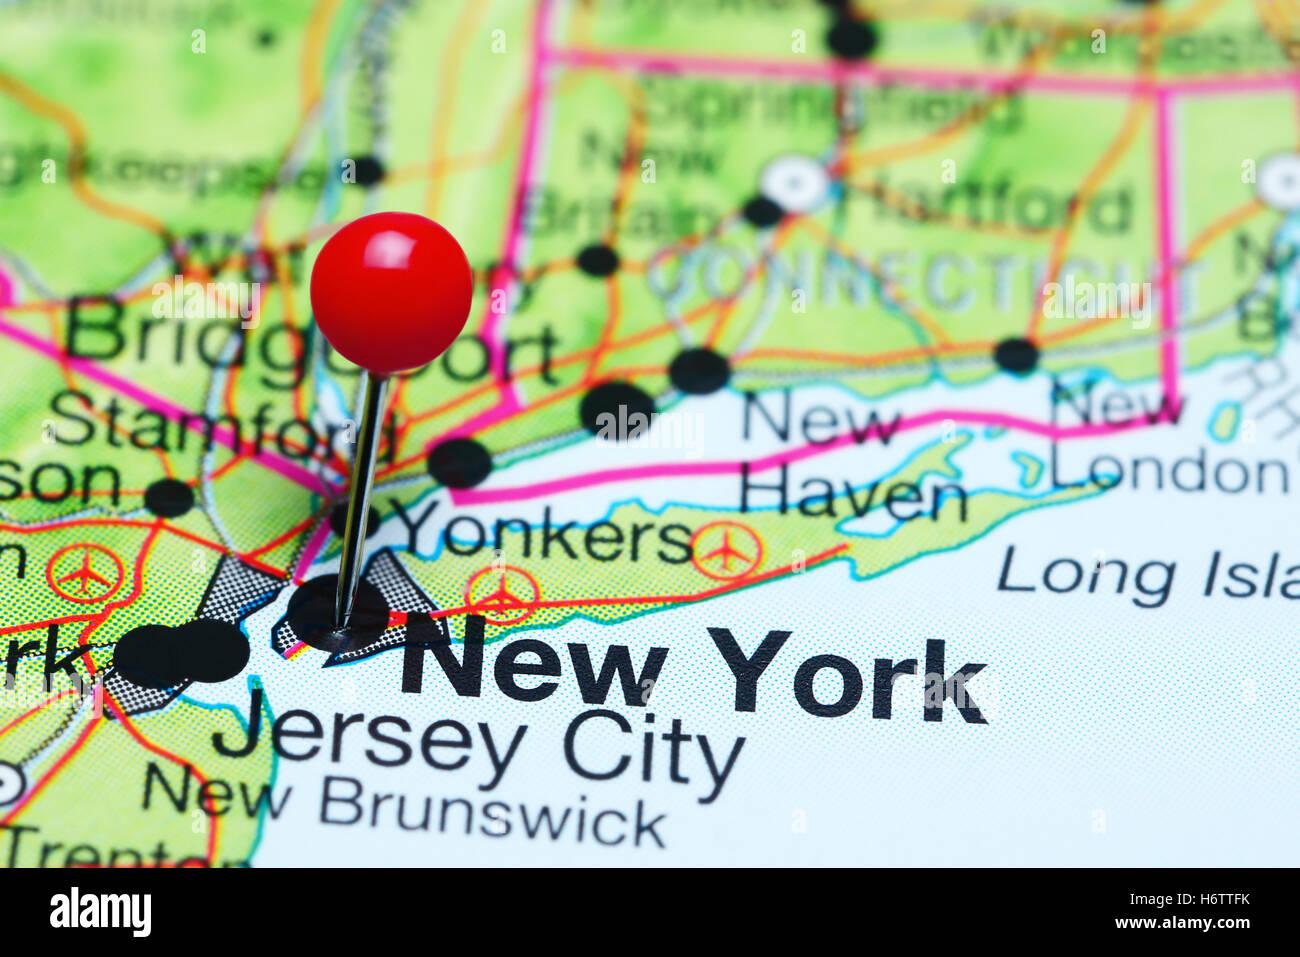 Report Across The States With JetBlue LateDeparturecom Las Vegas - Nyc radar map